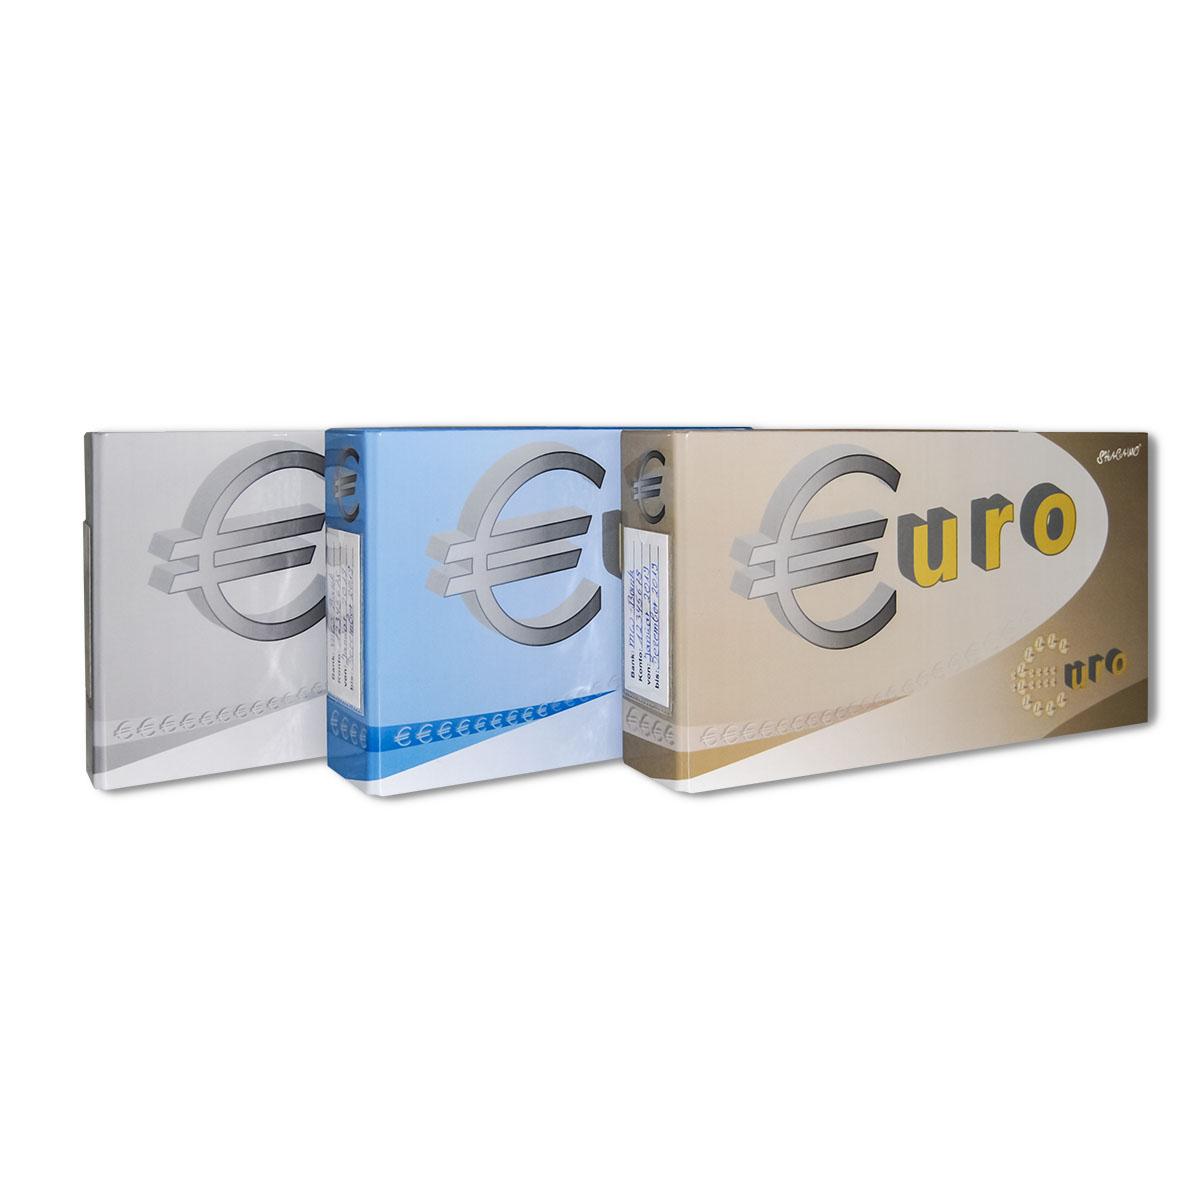 Kontoauszugsordner DIN C6 Image